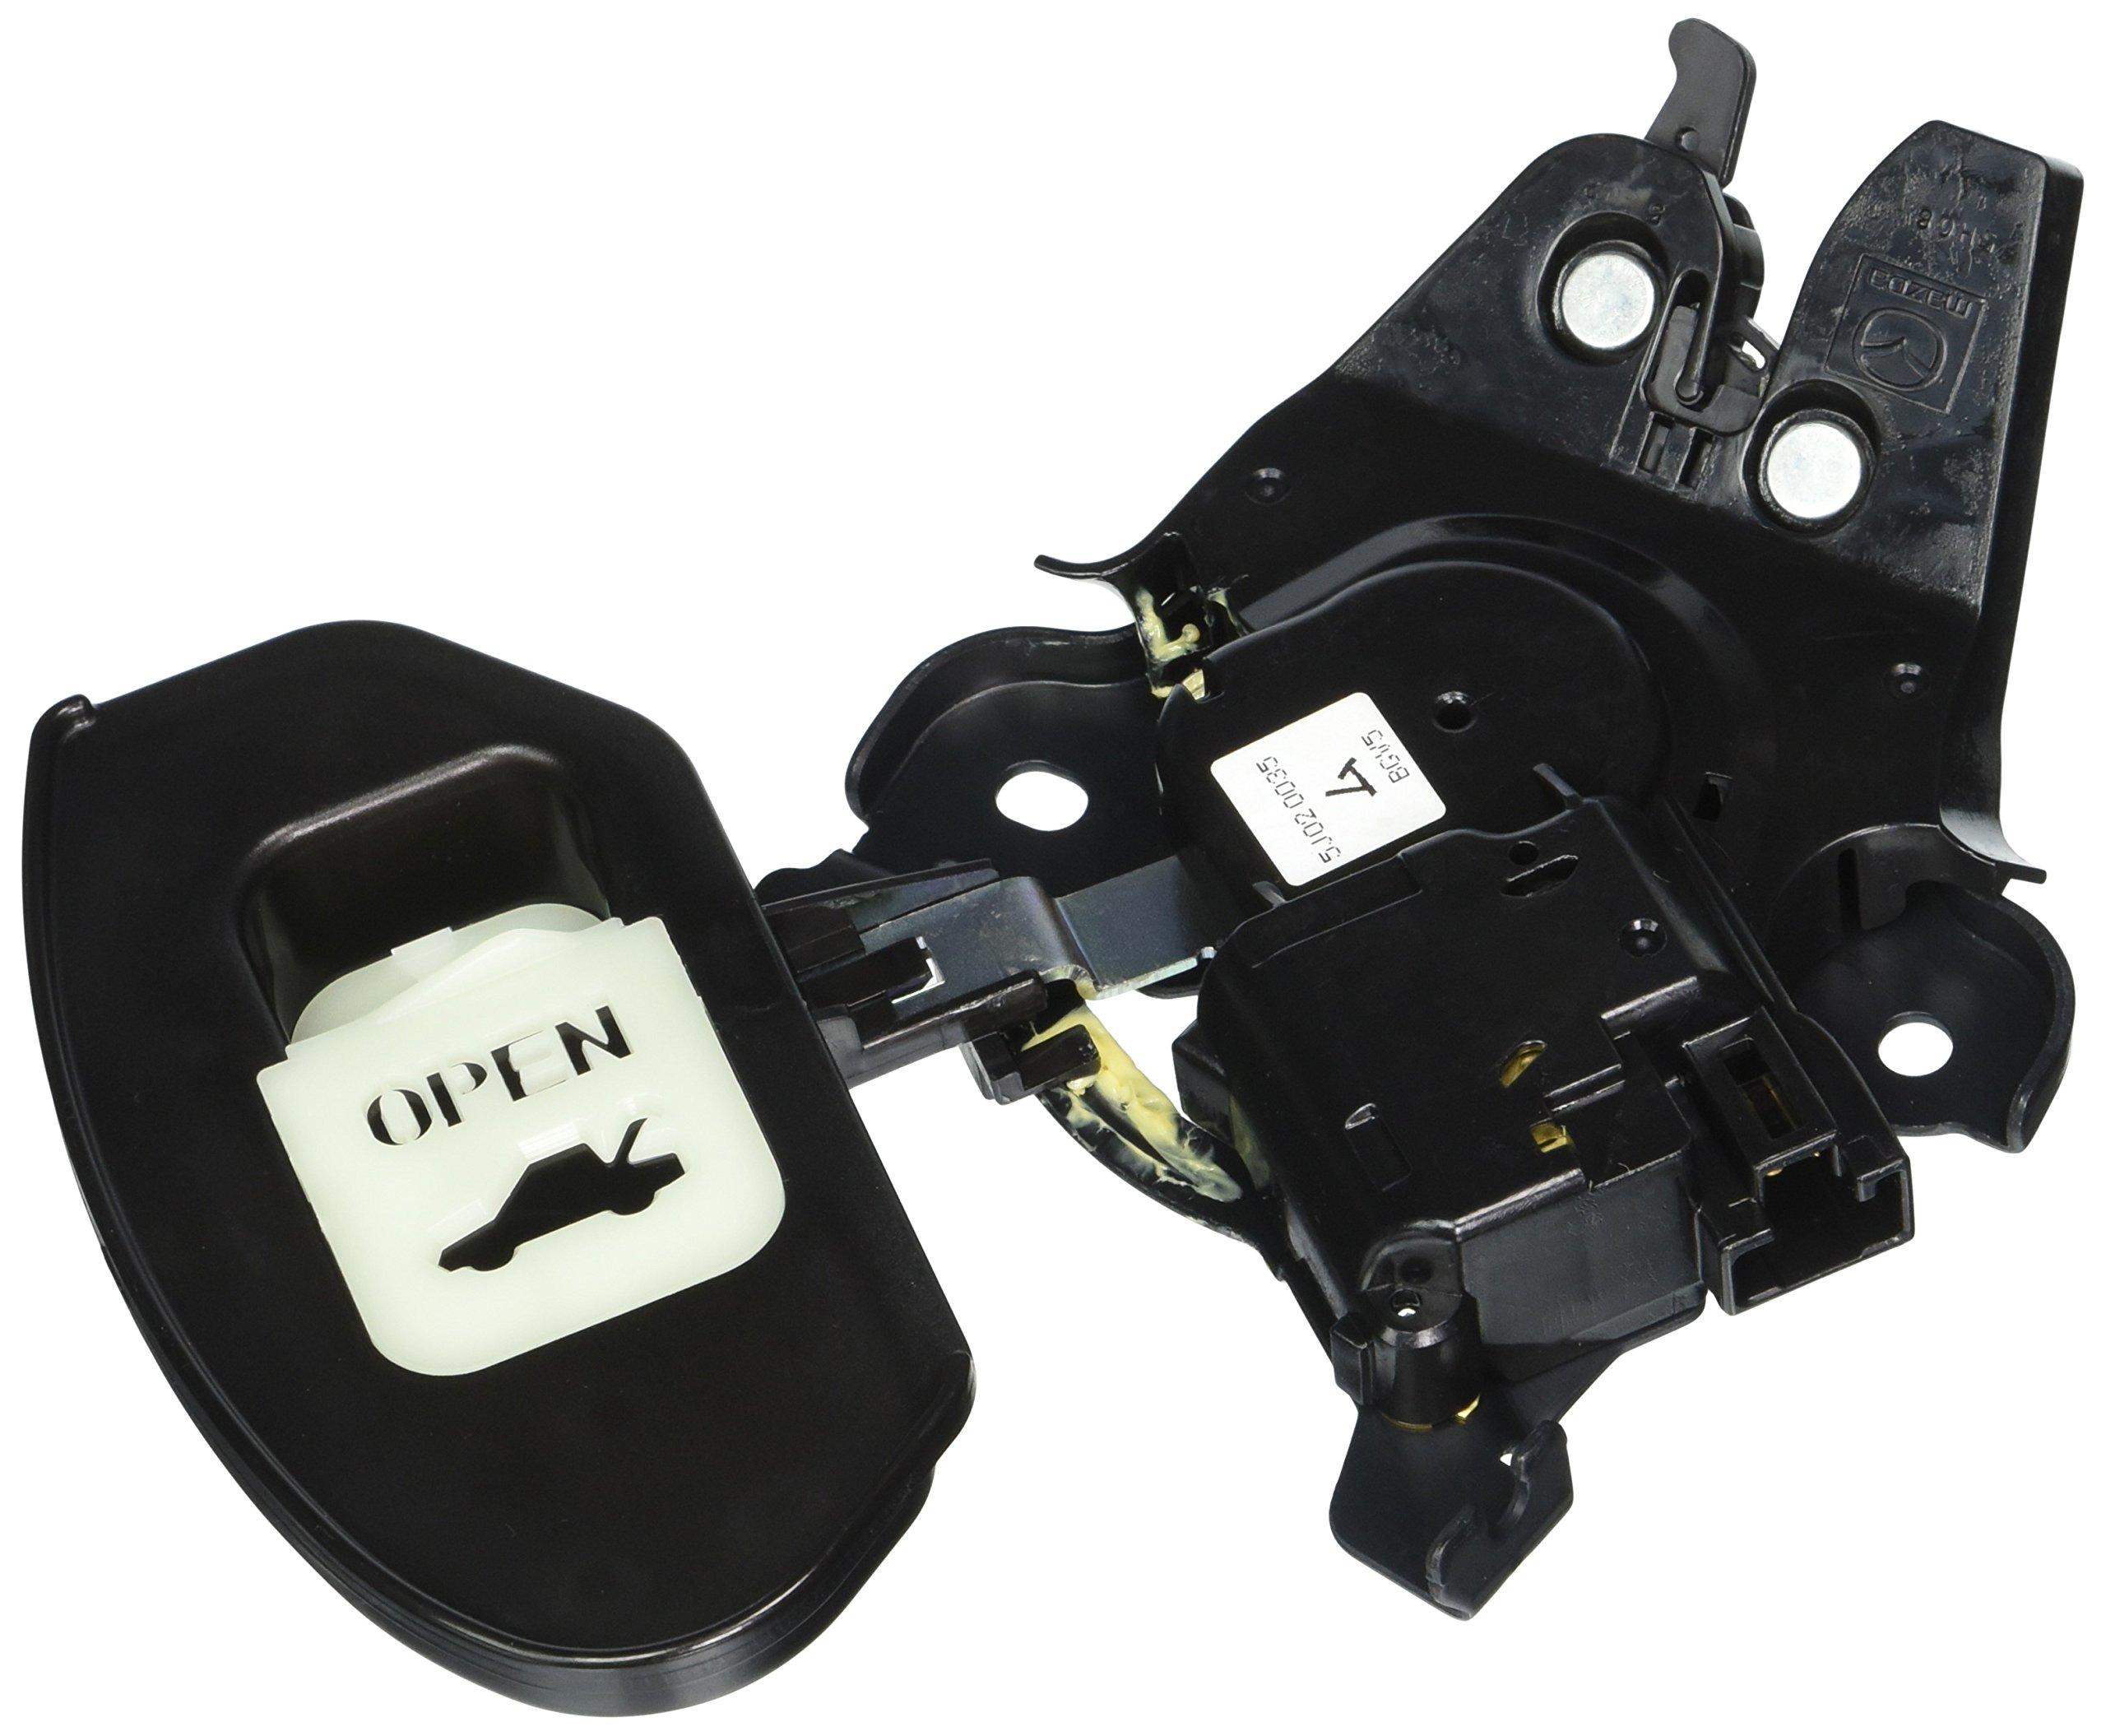 Genuine Mazda BGV5-56-820 Lid Lock by Mazda